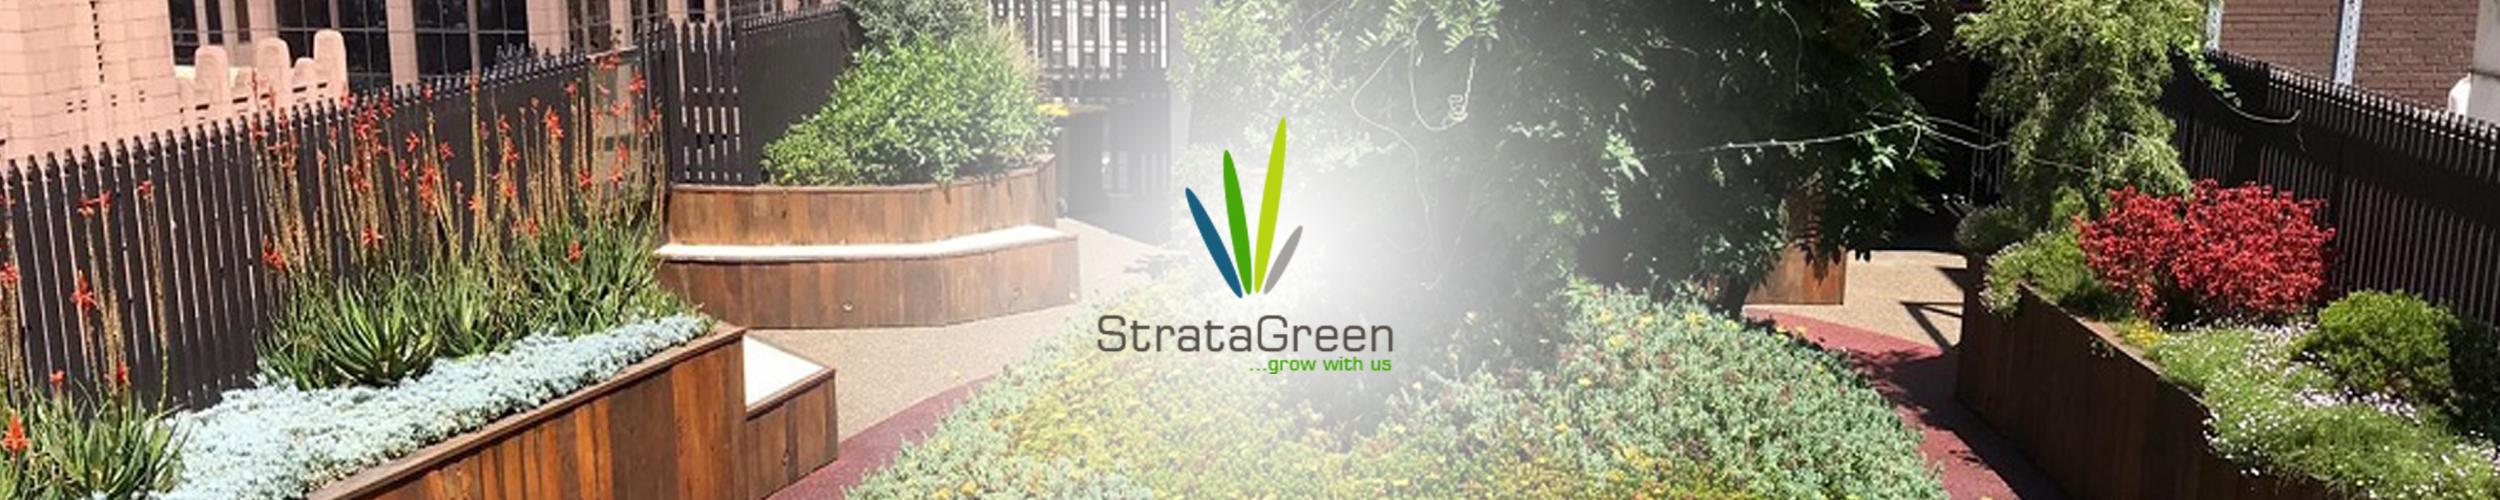 StrataGreen